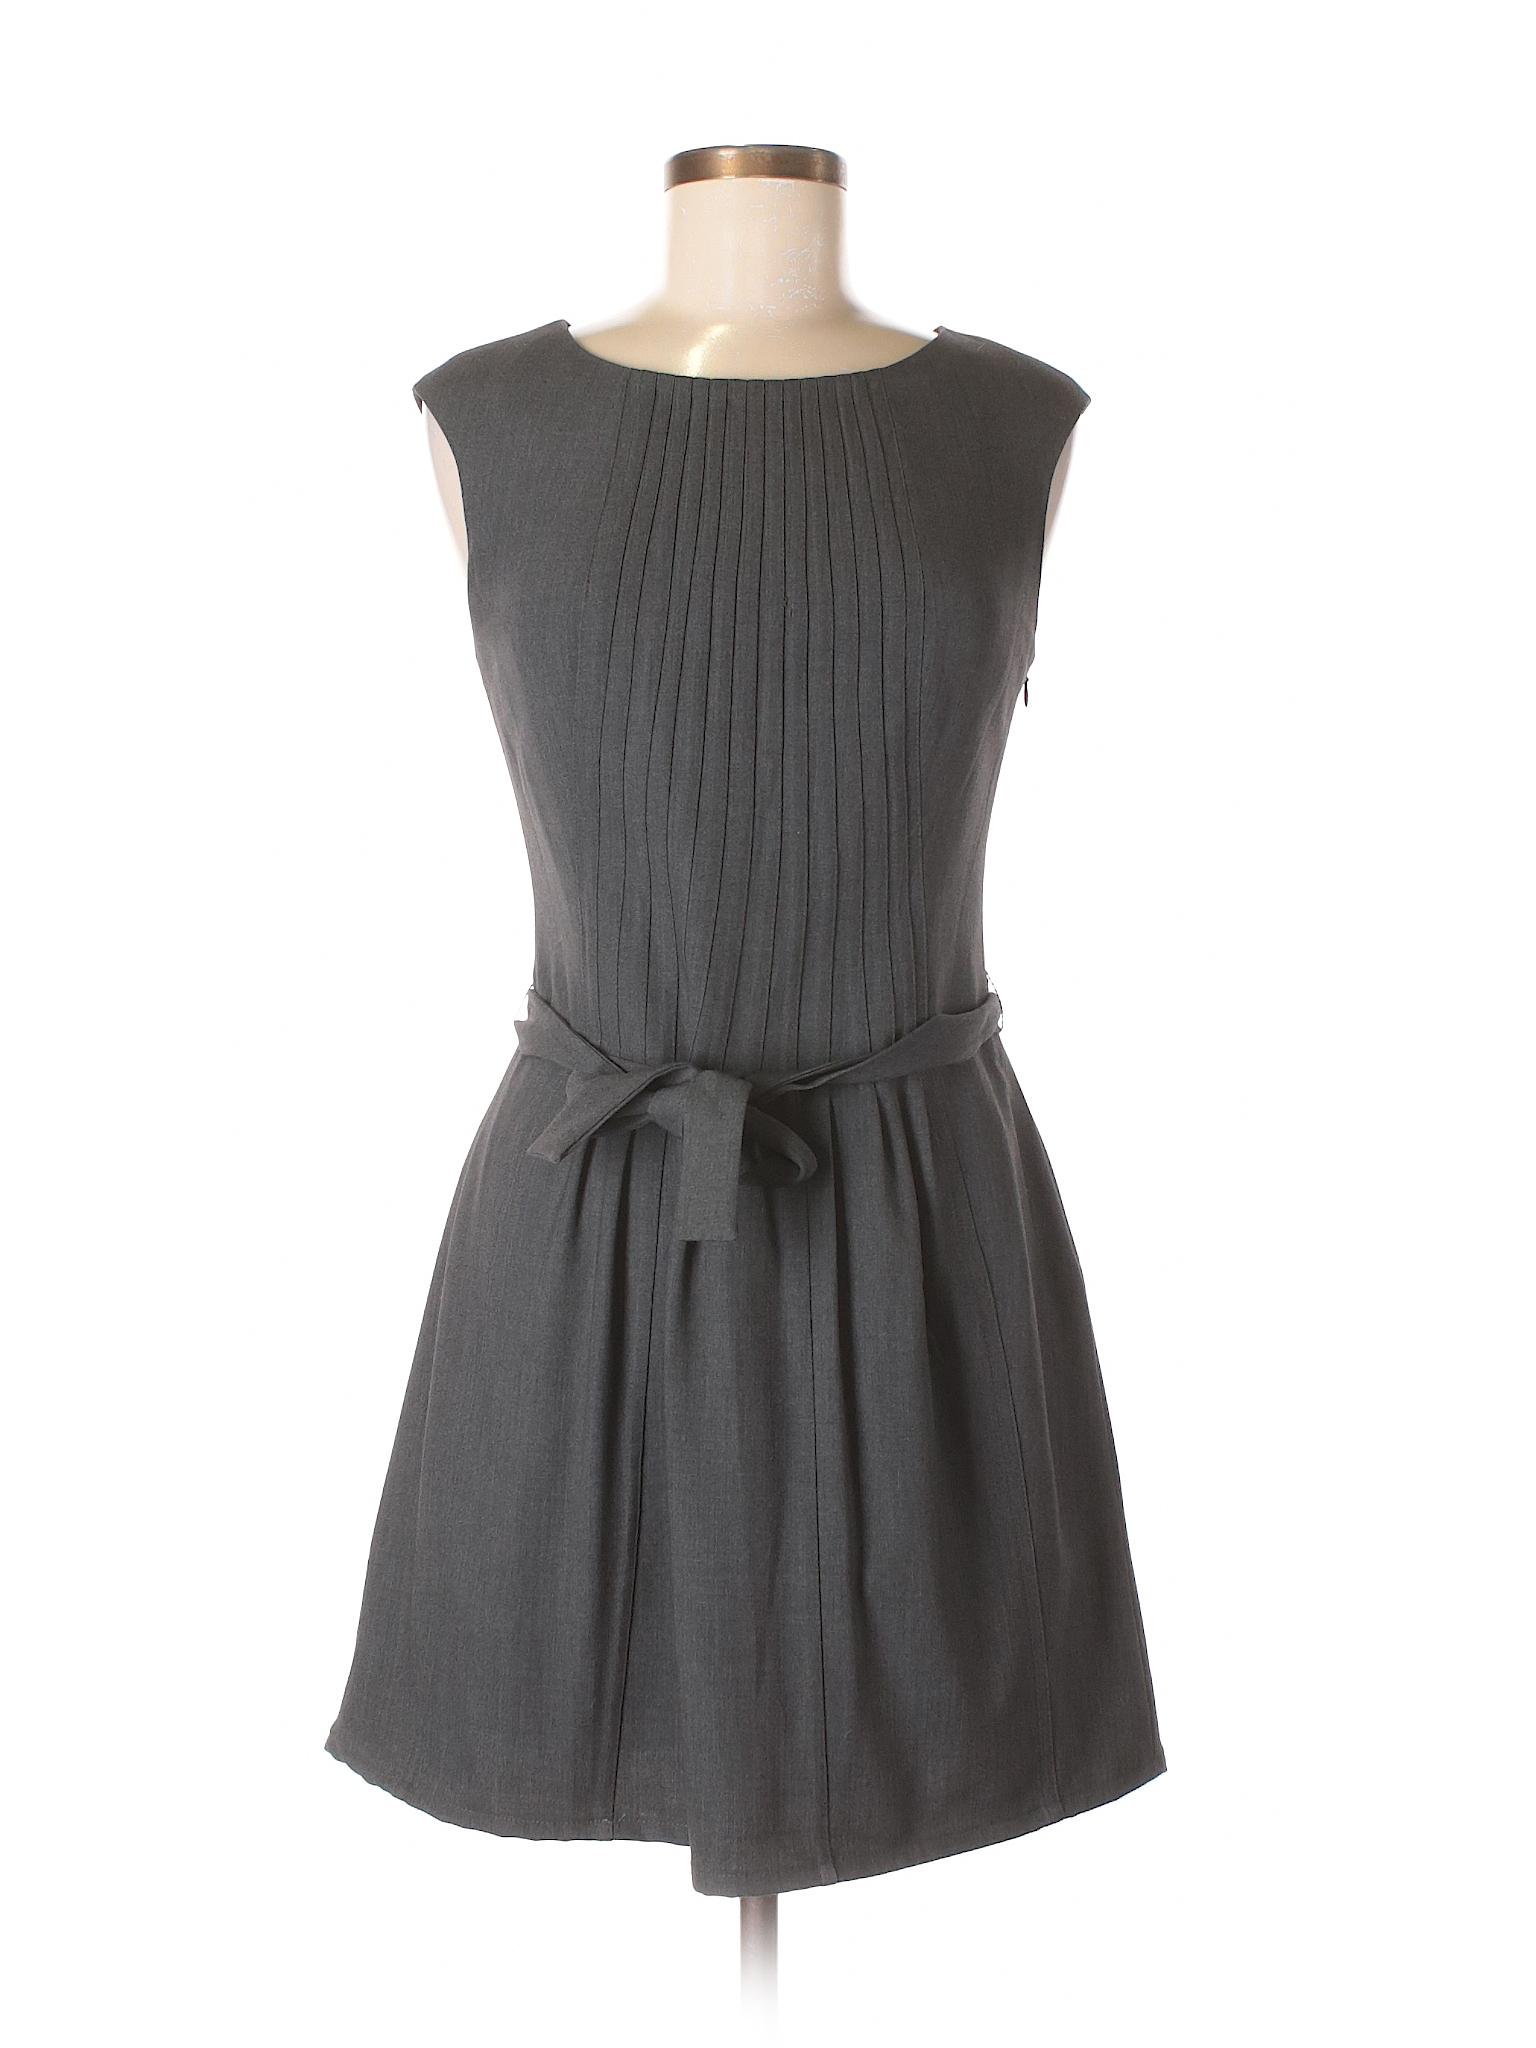 winter Casual Klein Boutique Dress Calvin 0qa7Odx